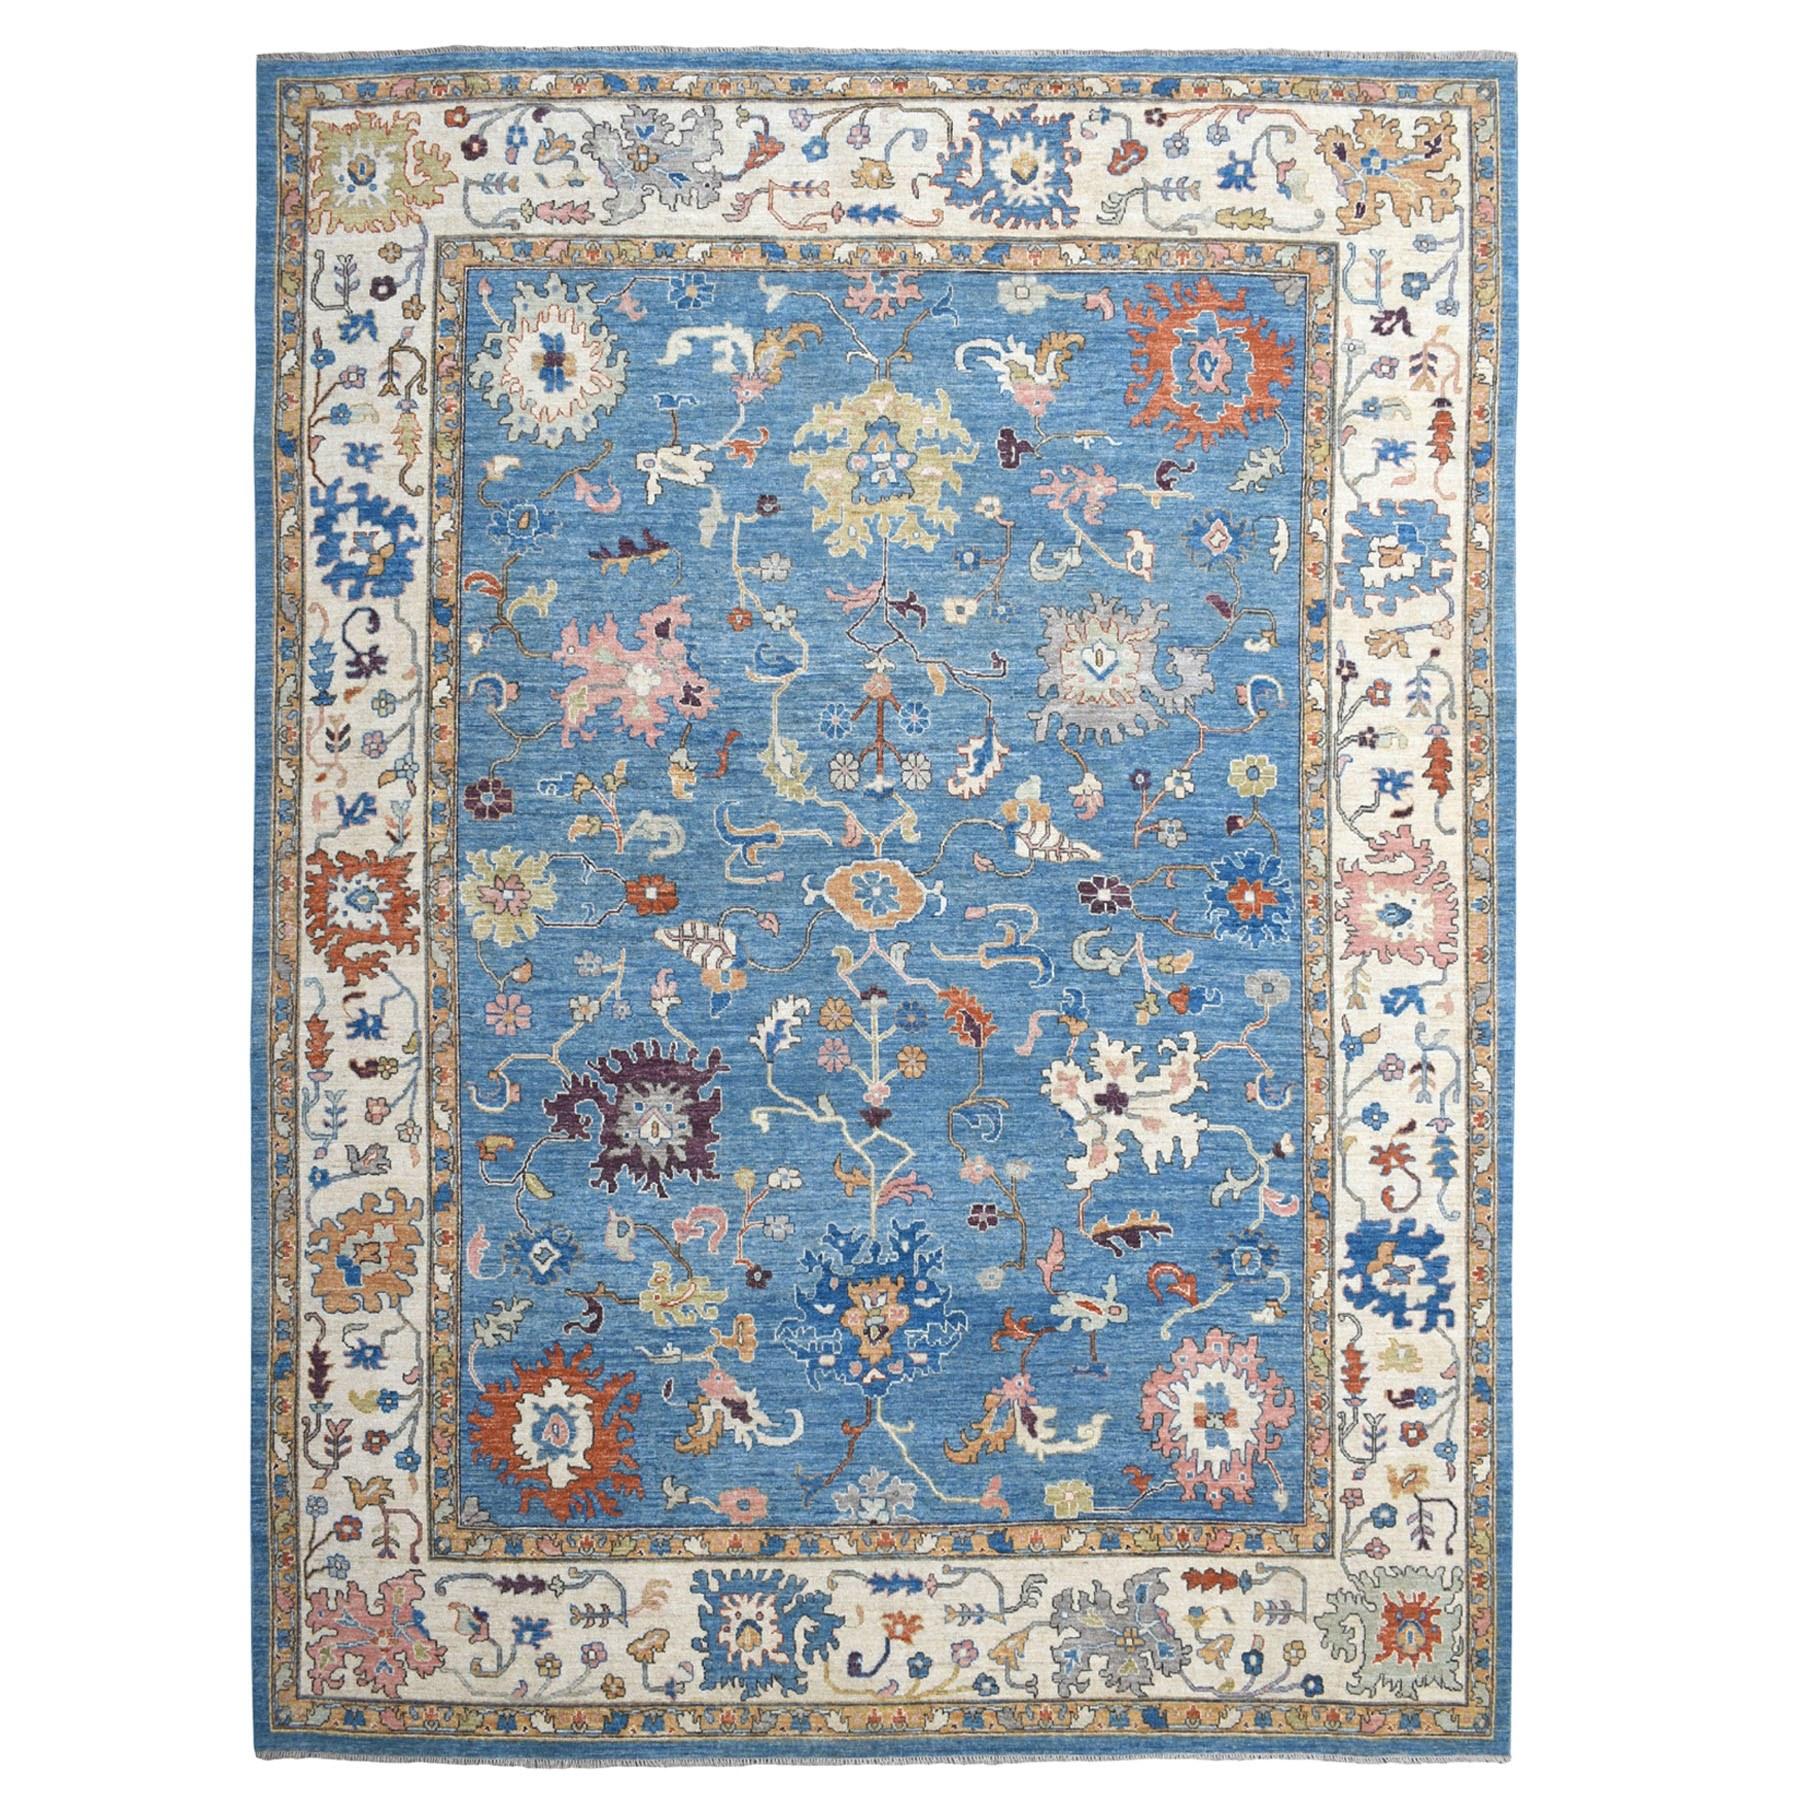 "11'10""X14'7"" Blue Oversized Angora Oushak Soft Velvety Wool Hand Knotted Oriental Rug moaec6e7"